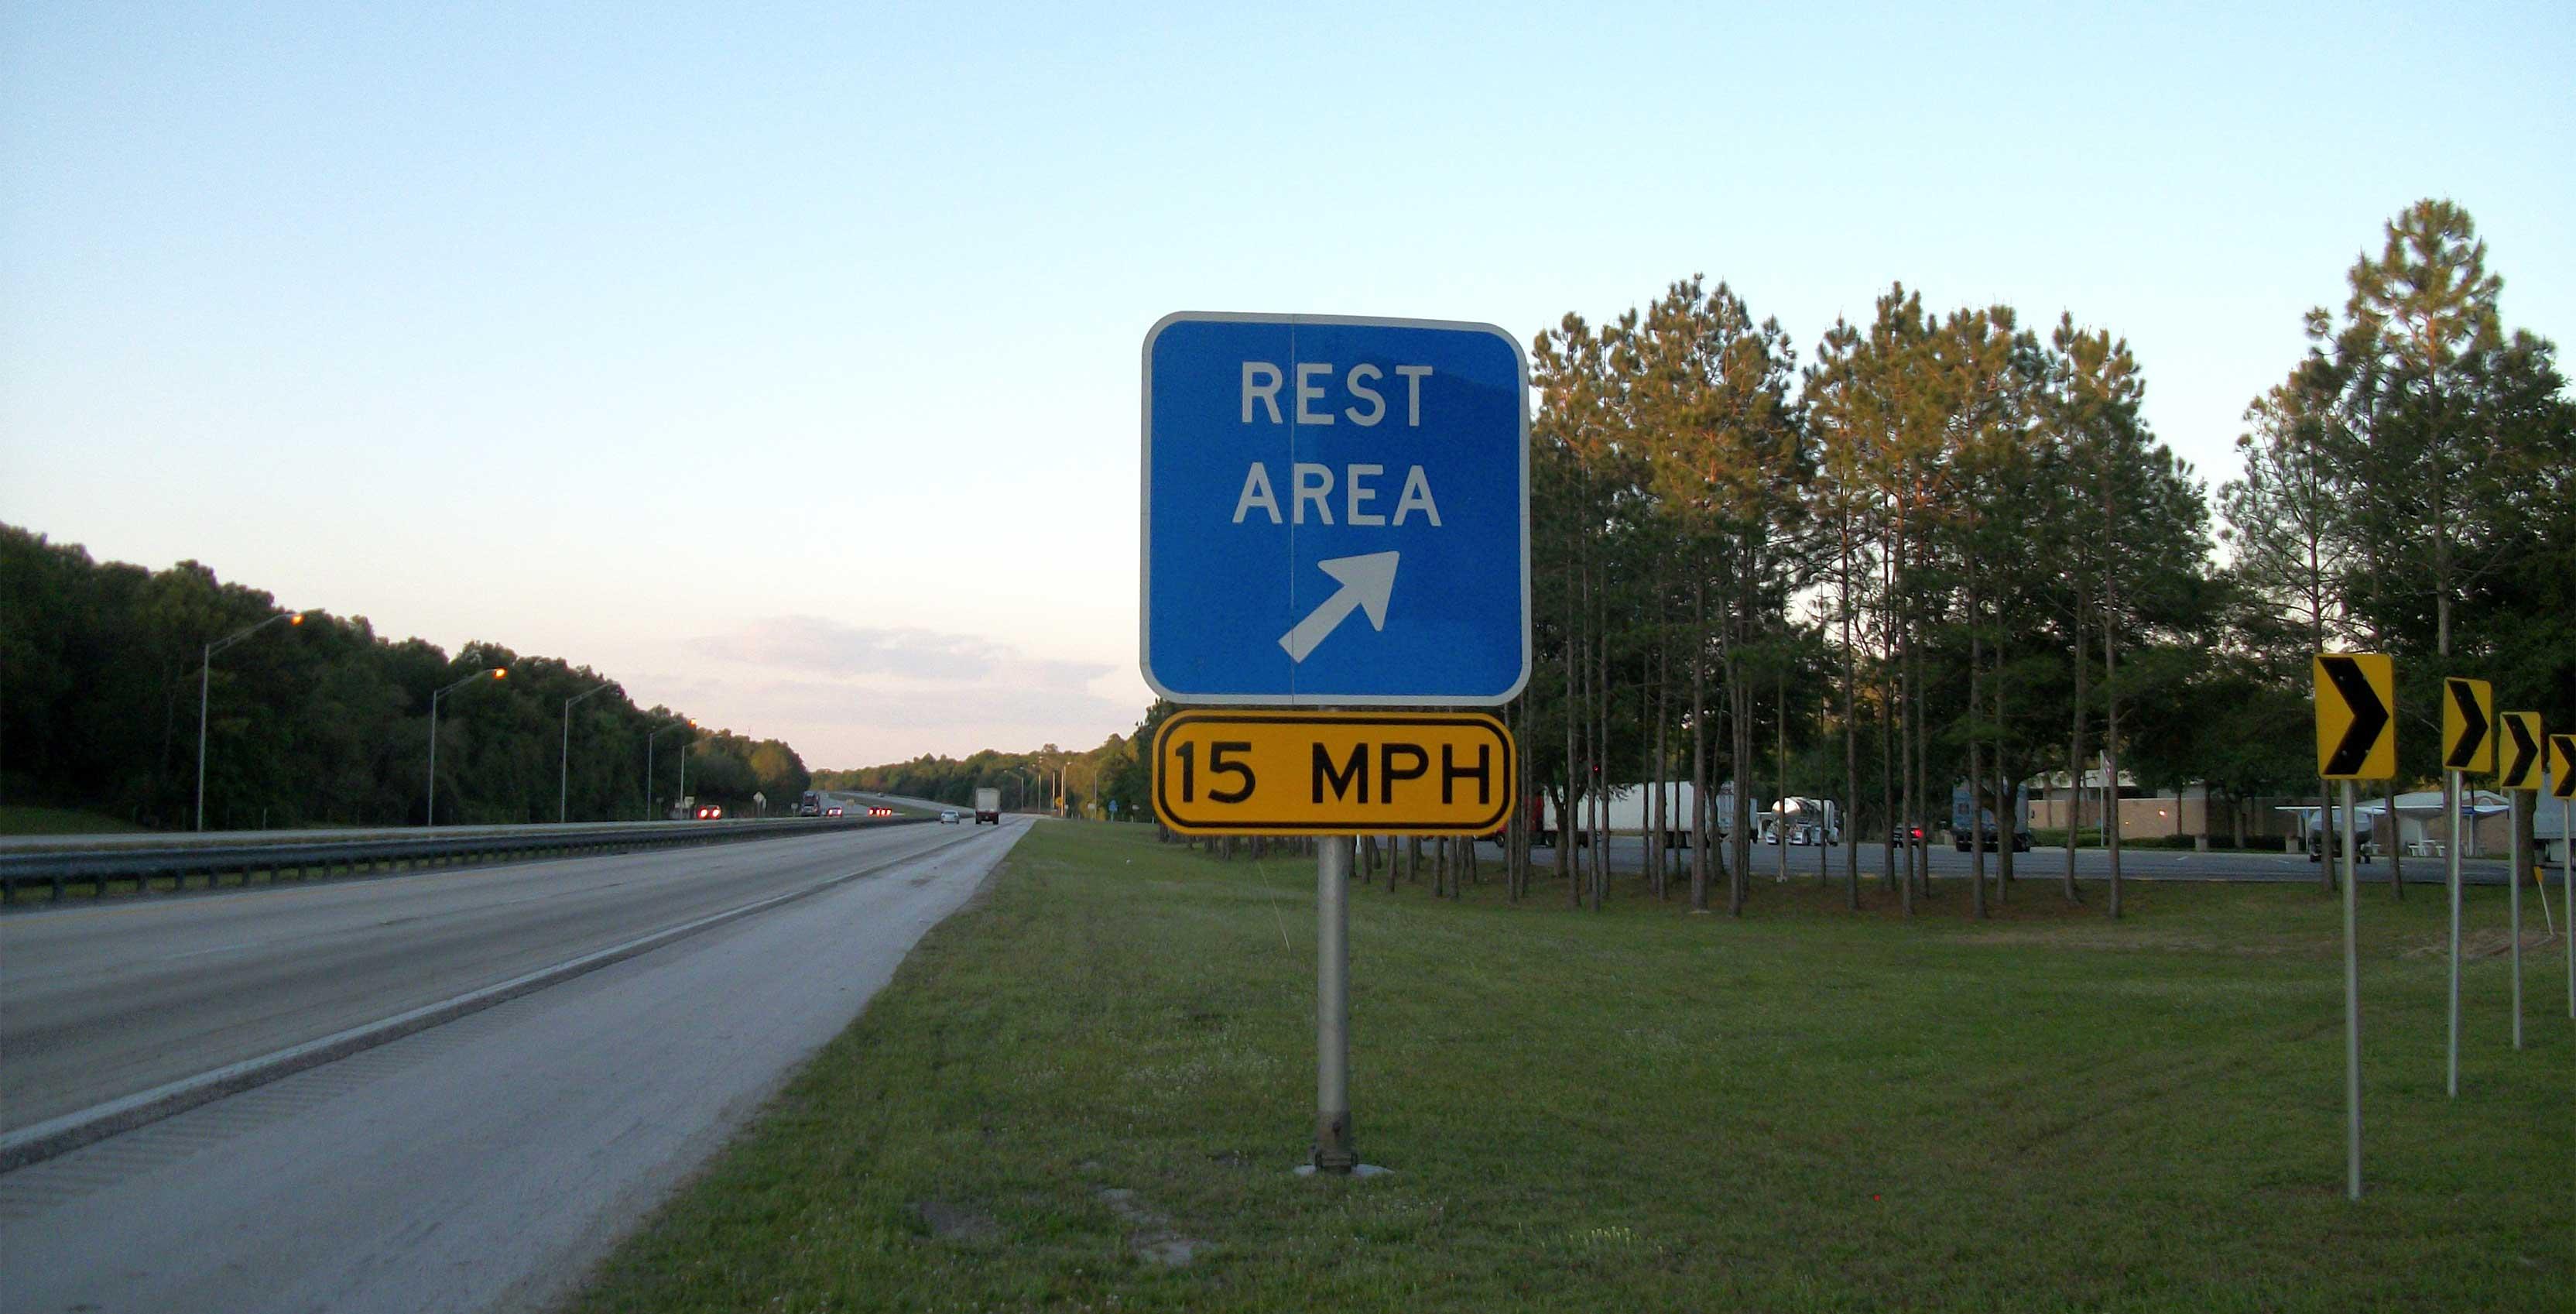 highway rest area